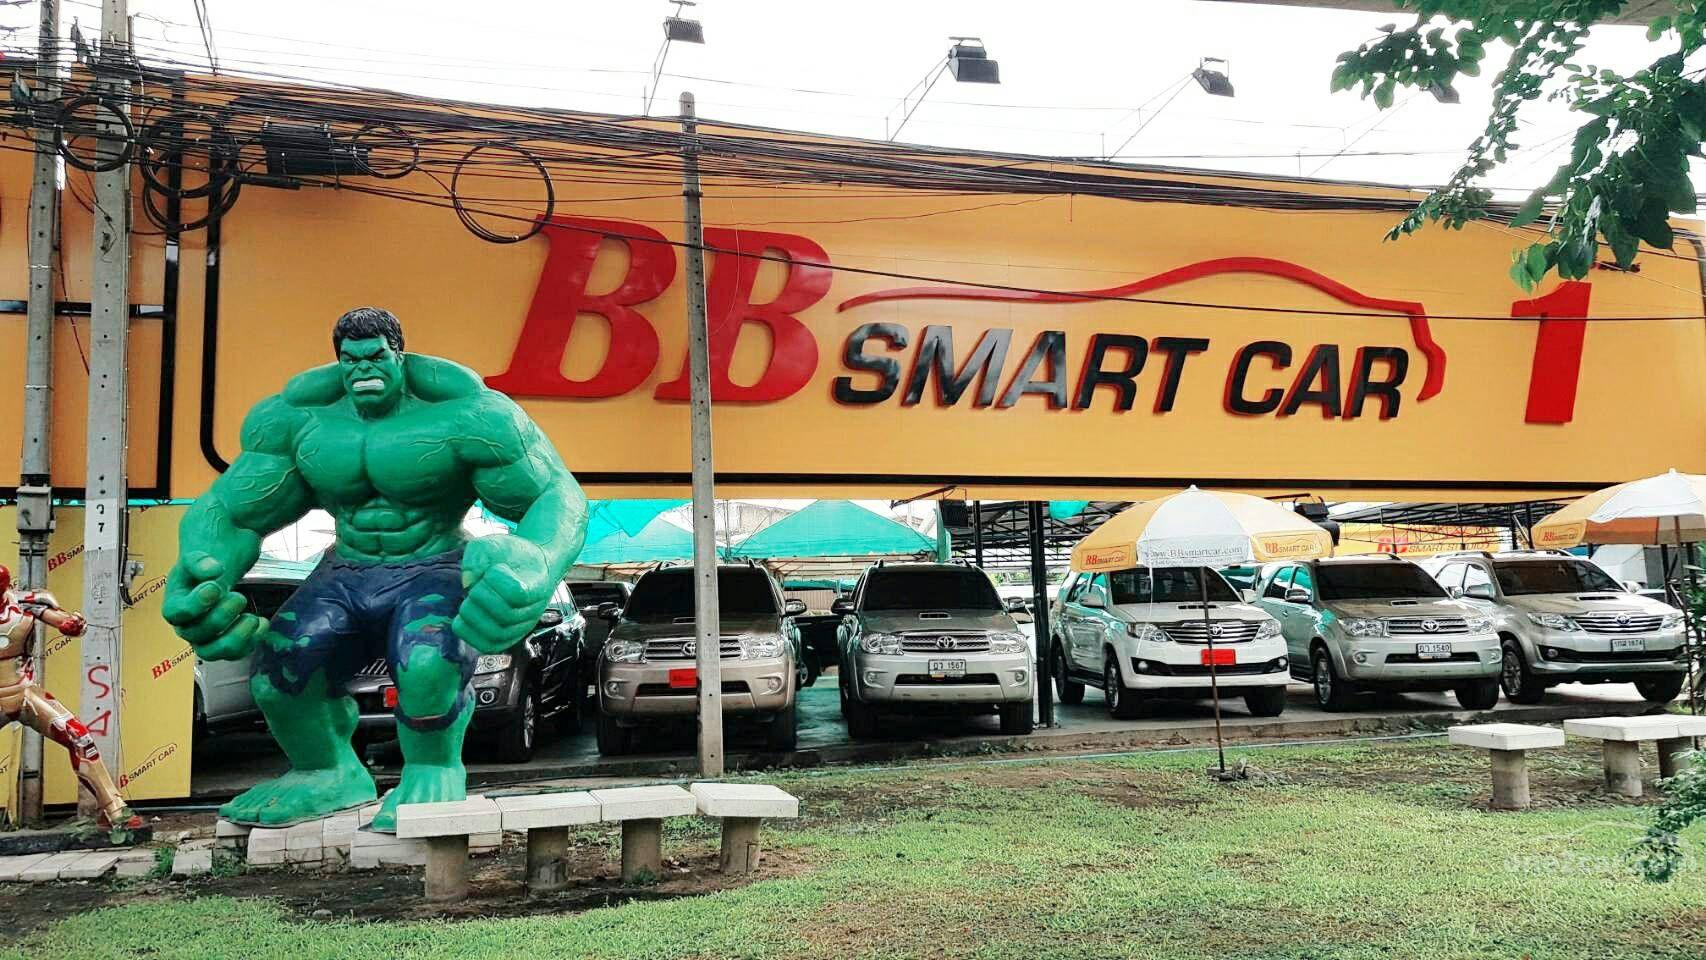 BB SMART CAR 1